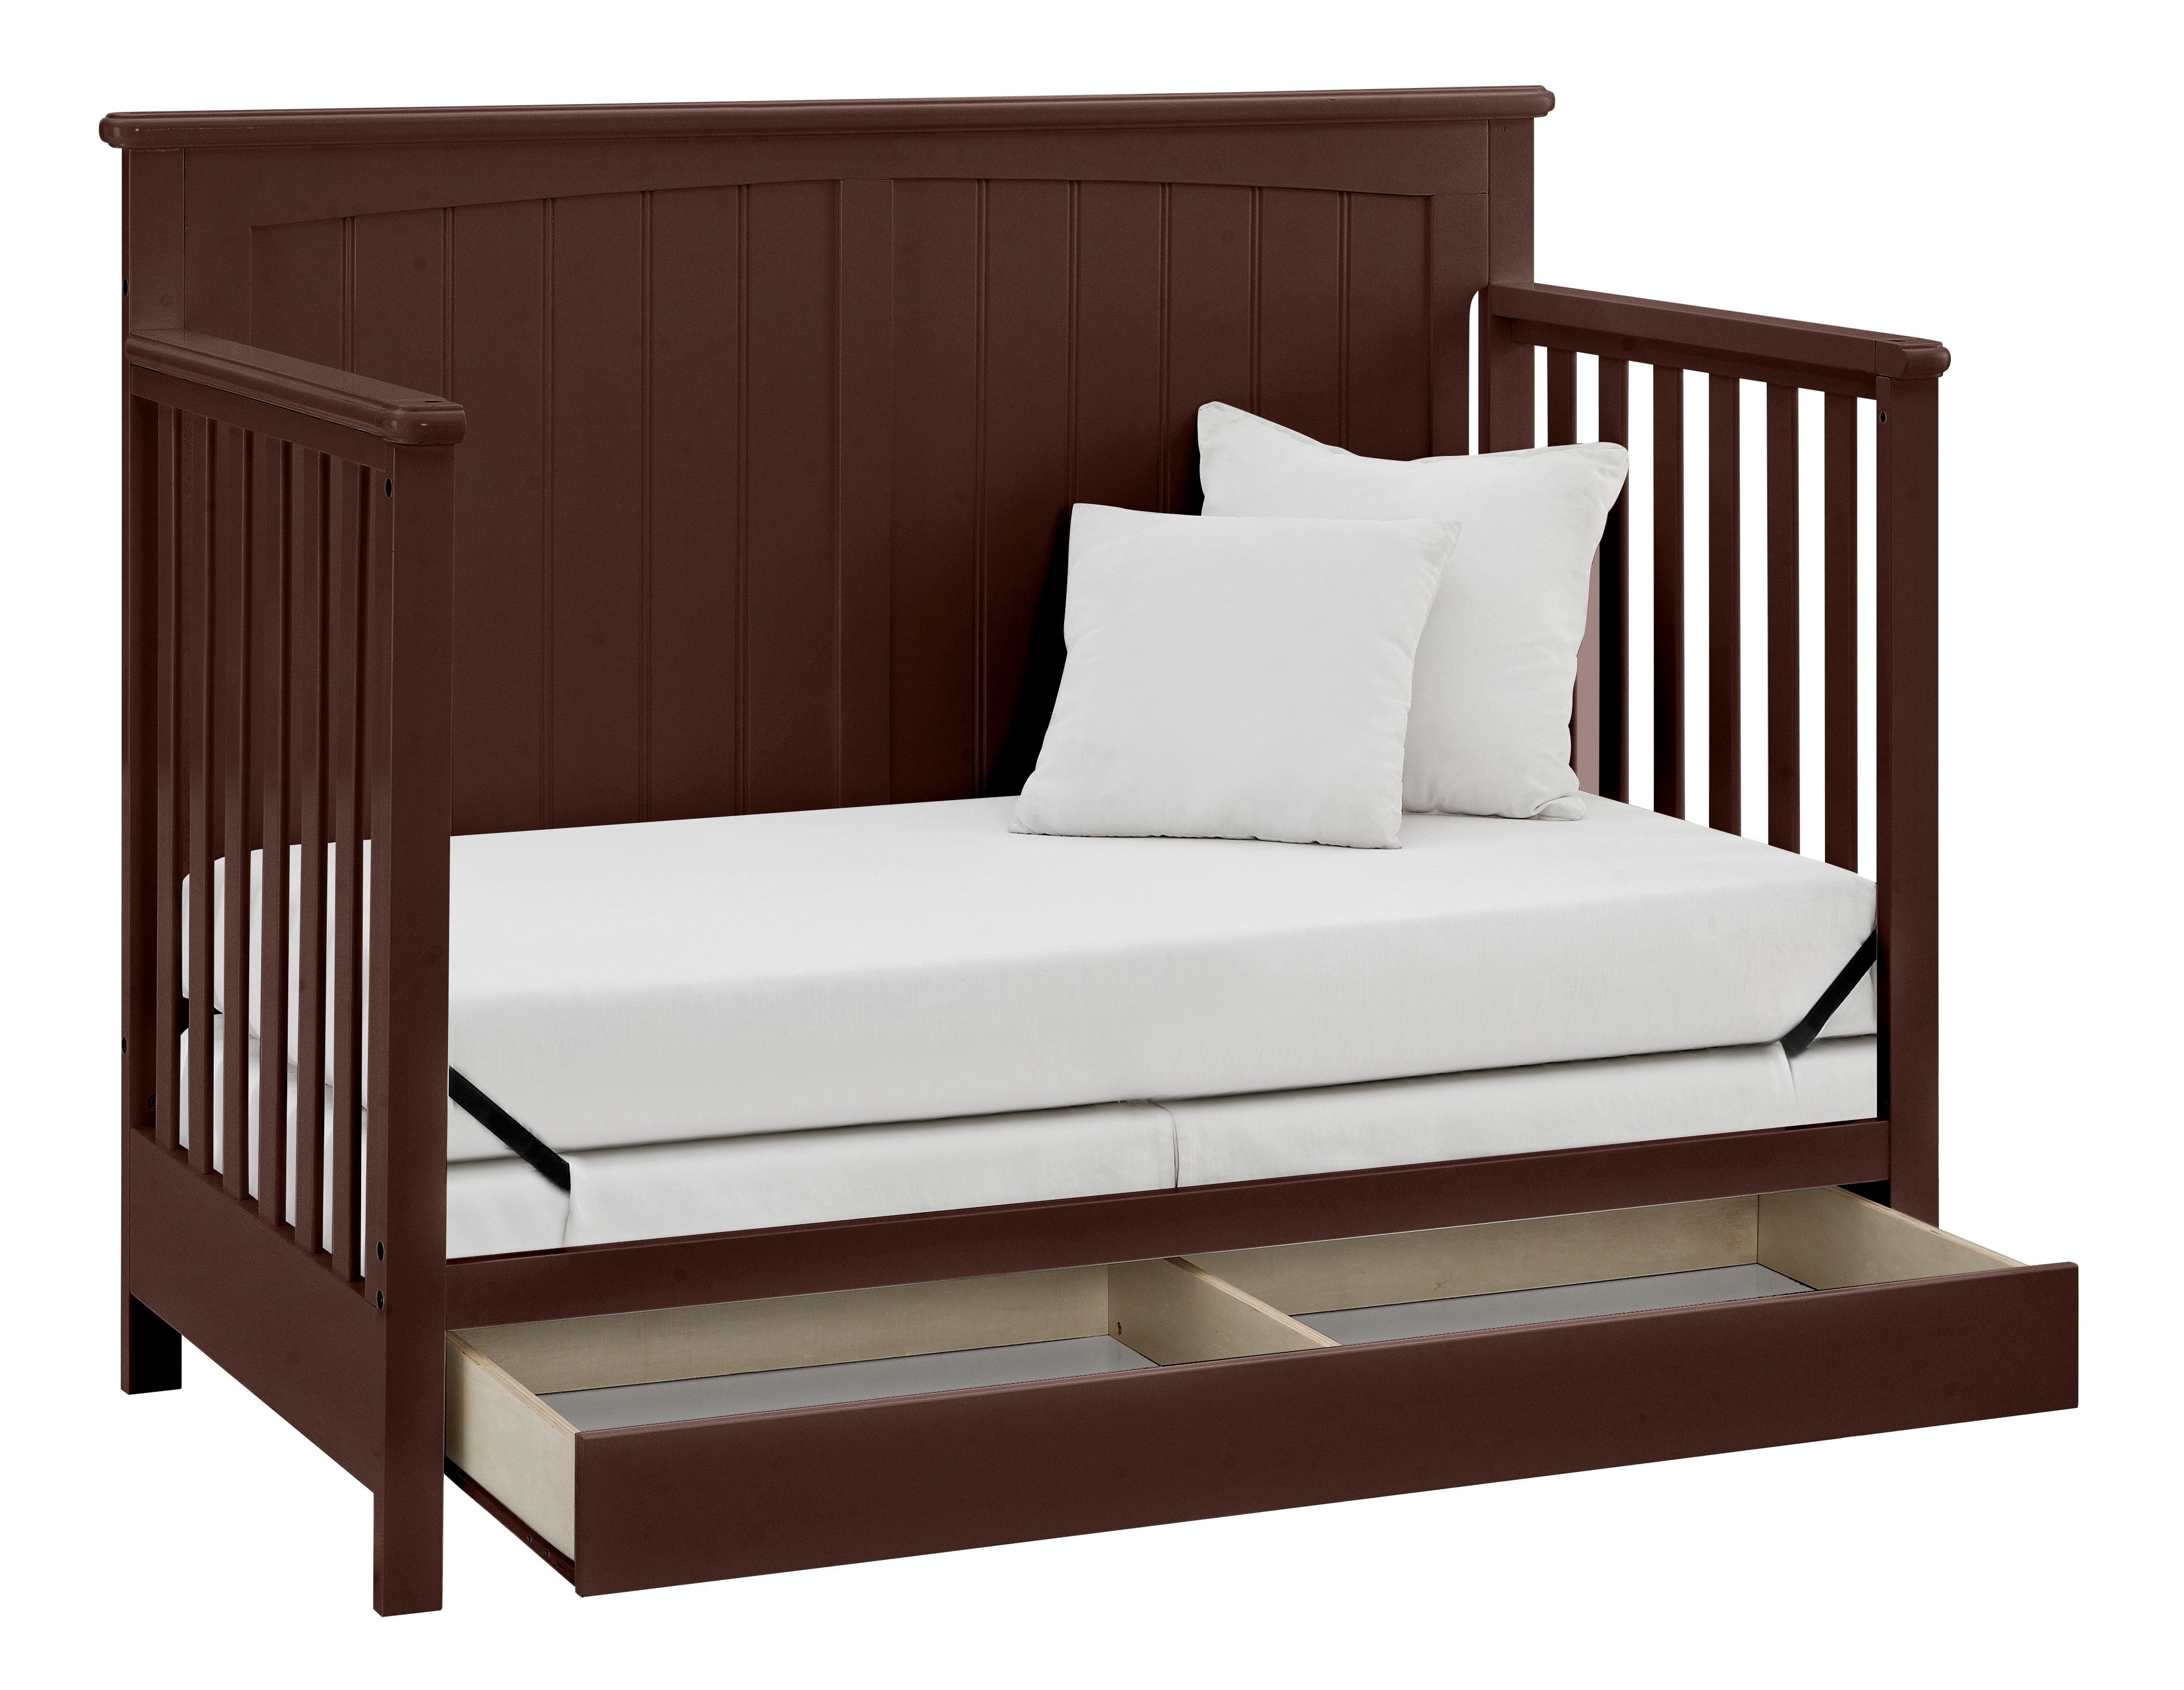 Amazon Com Stork Craft Davenport 5 In 1 Convertible Crib